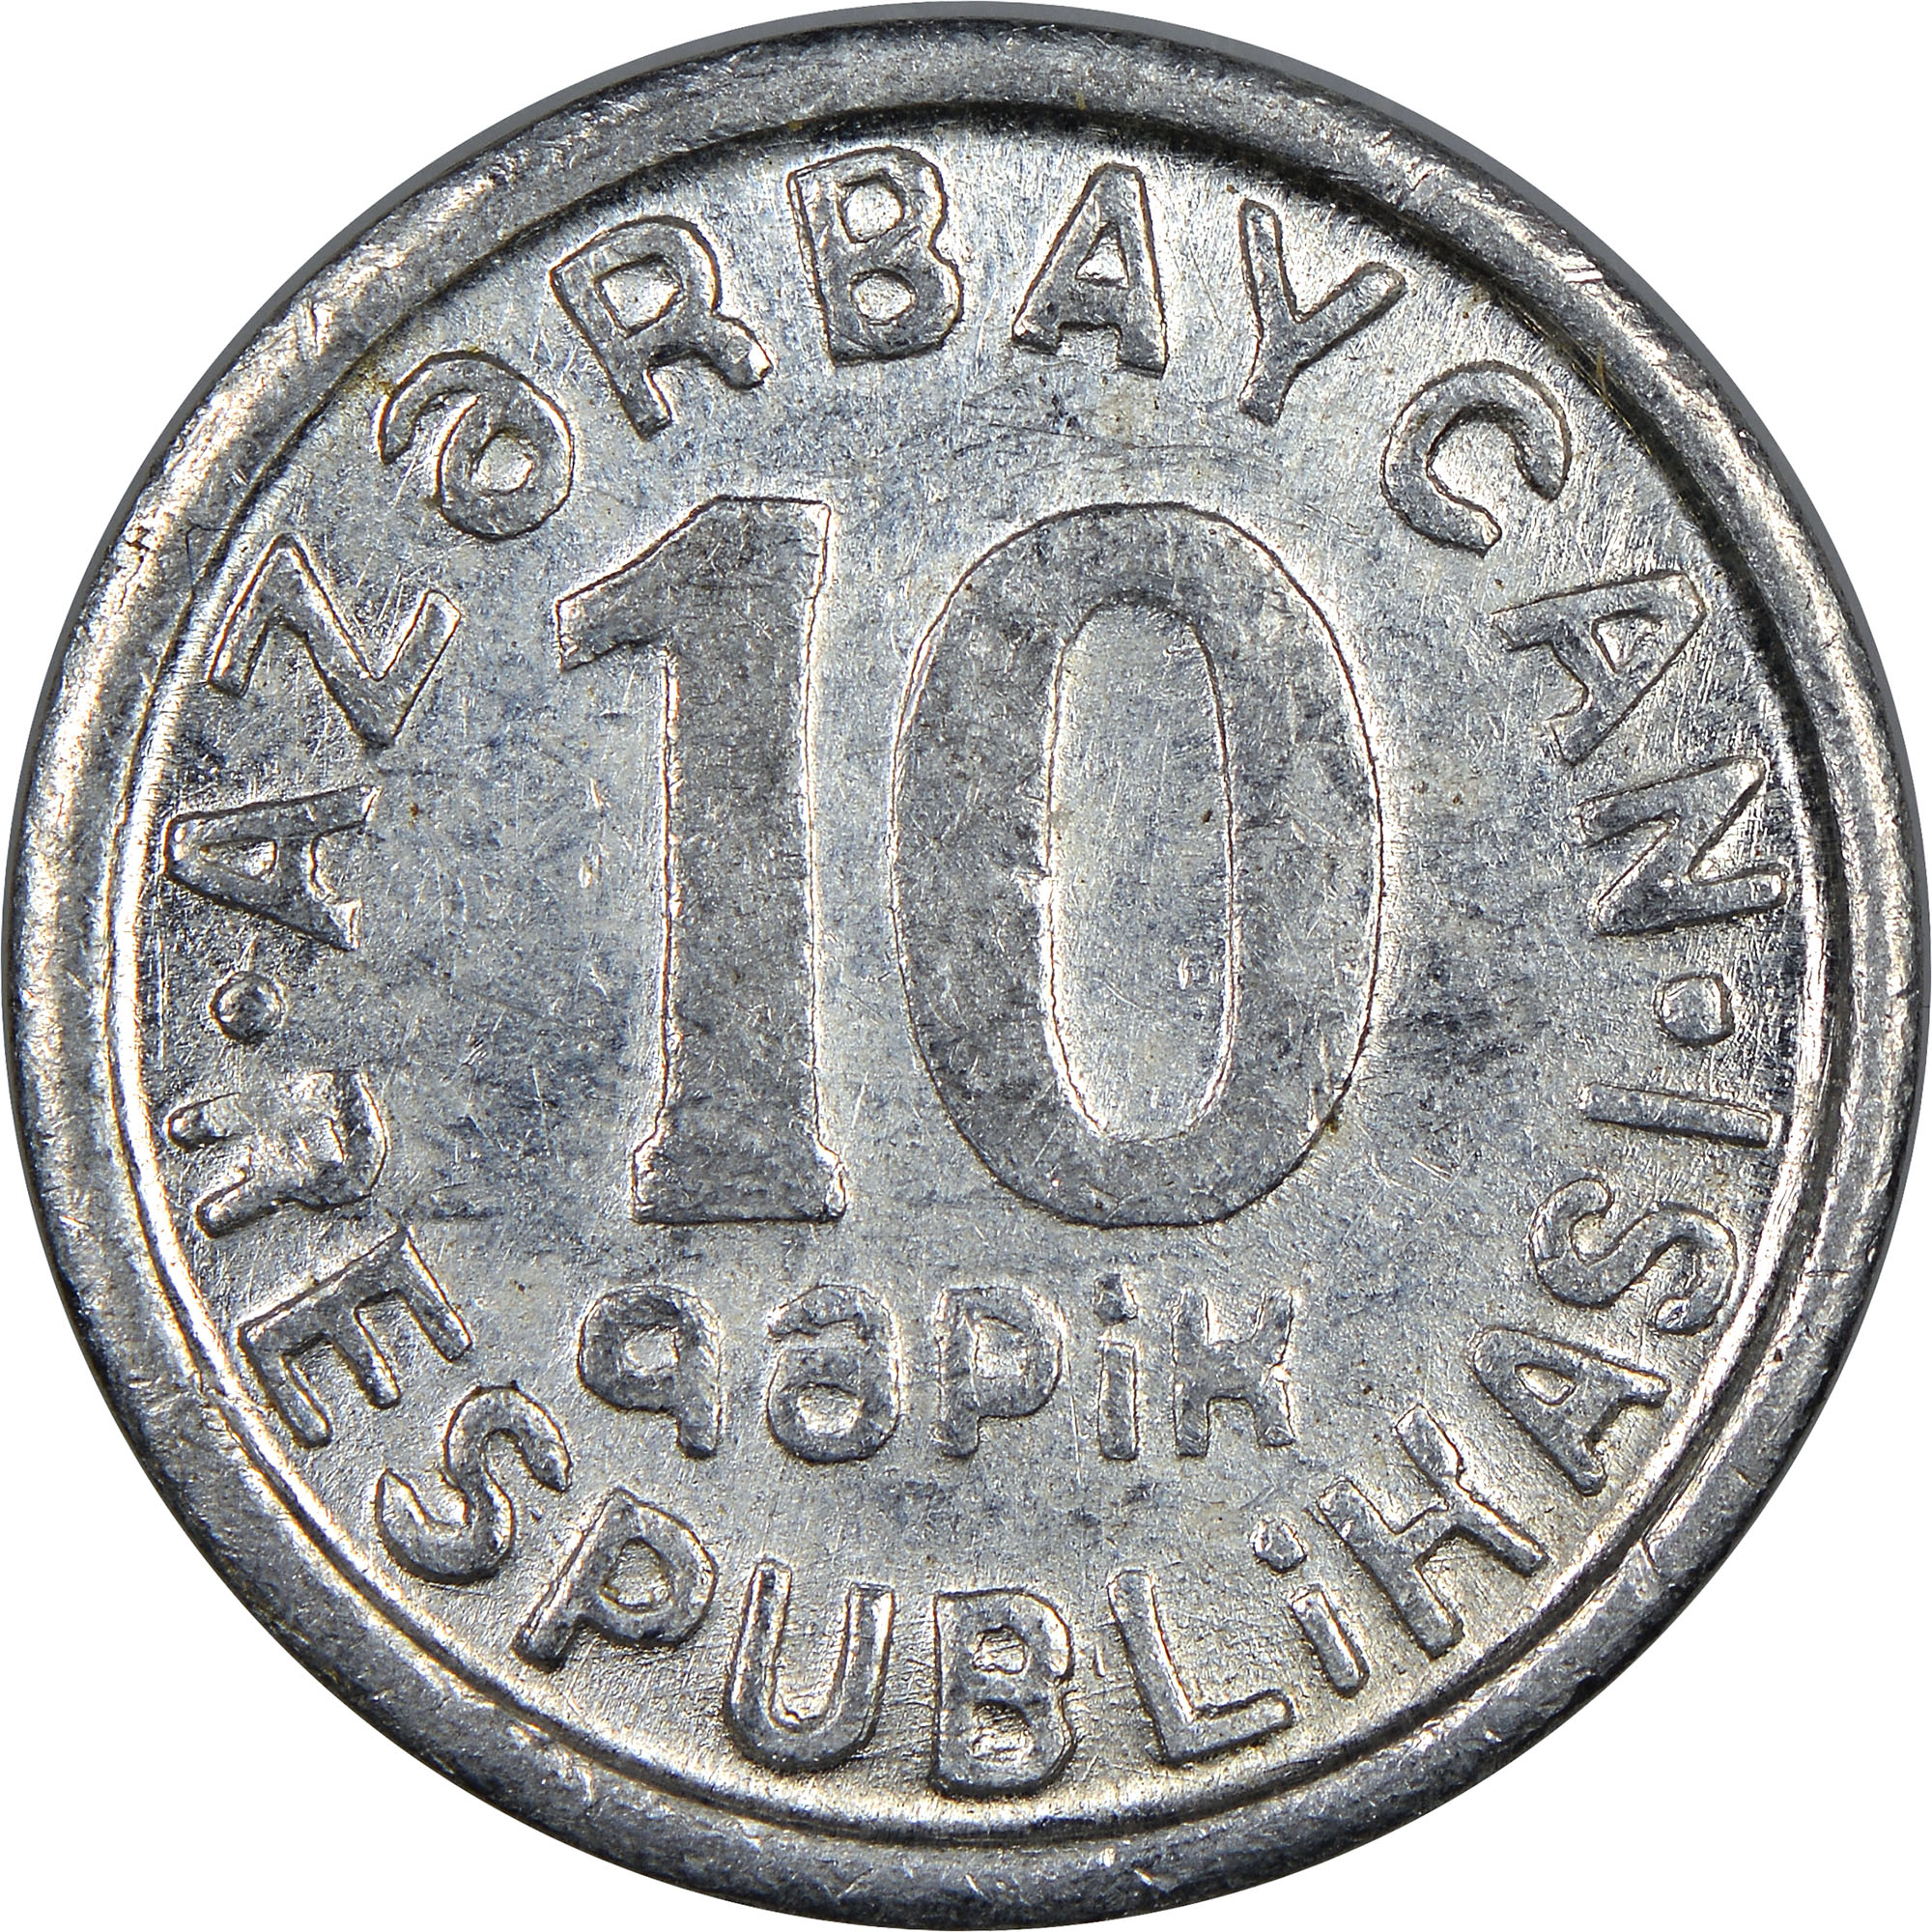 Azerbaijan 10 Qapik obverse